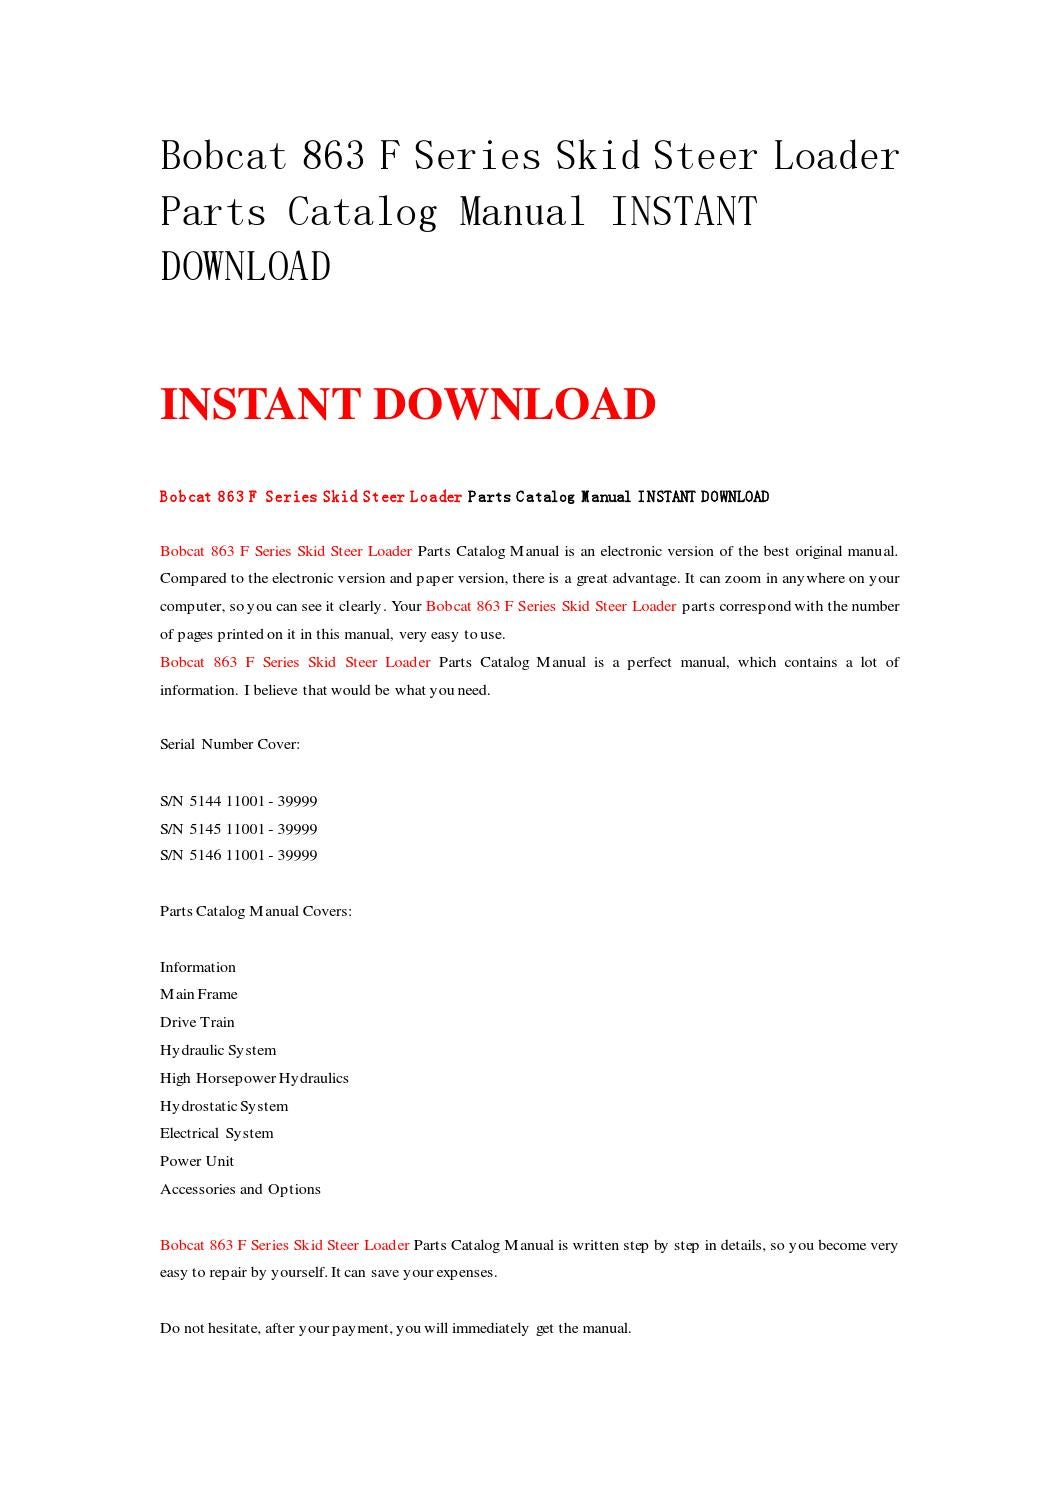 Bobcat 863 f series skid steer loader parts catalog manual